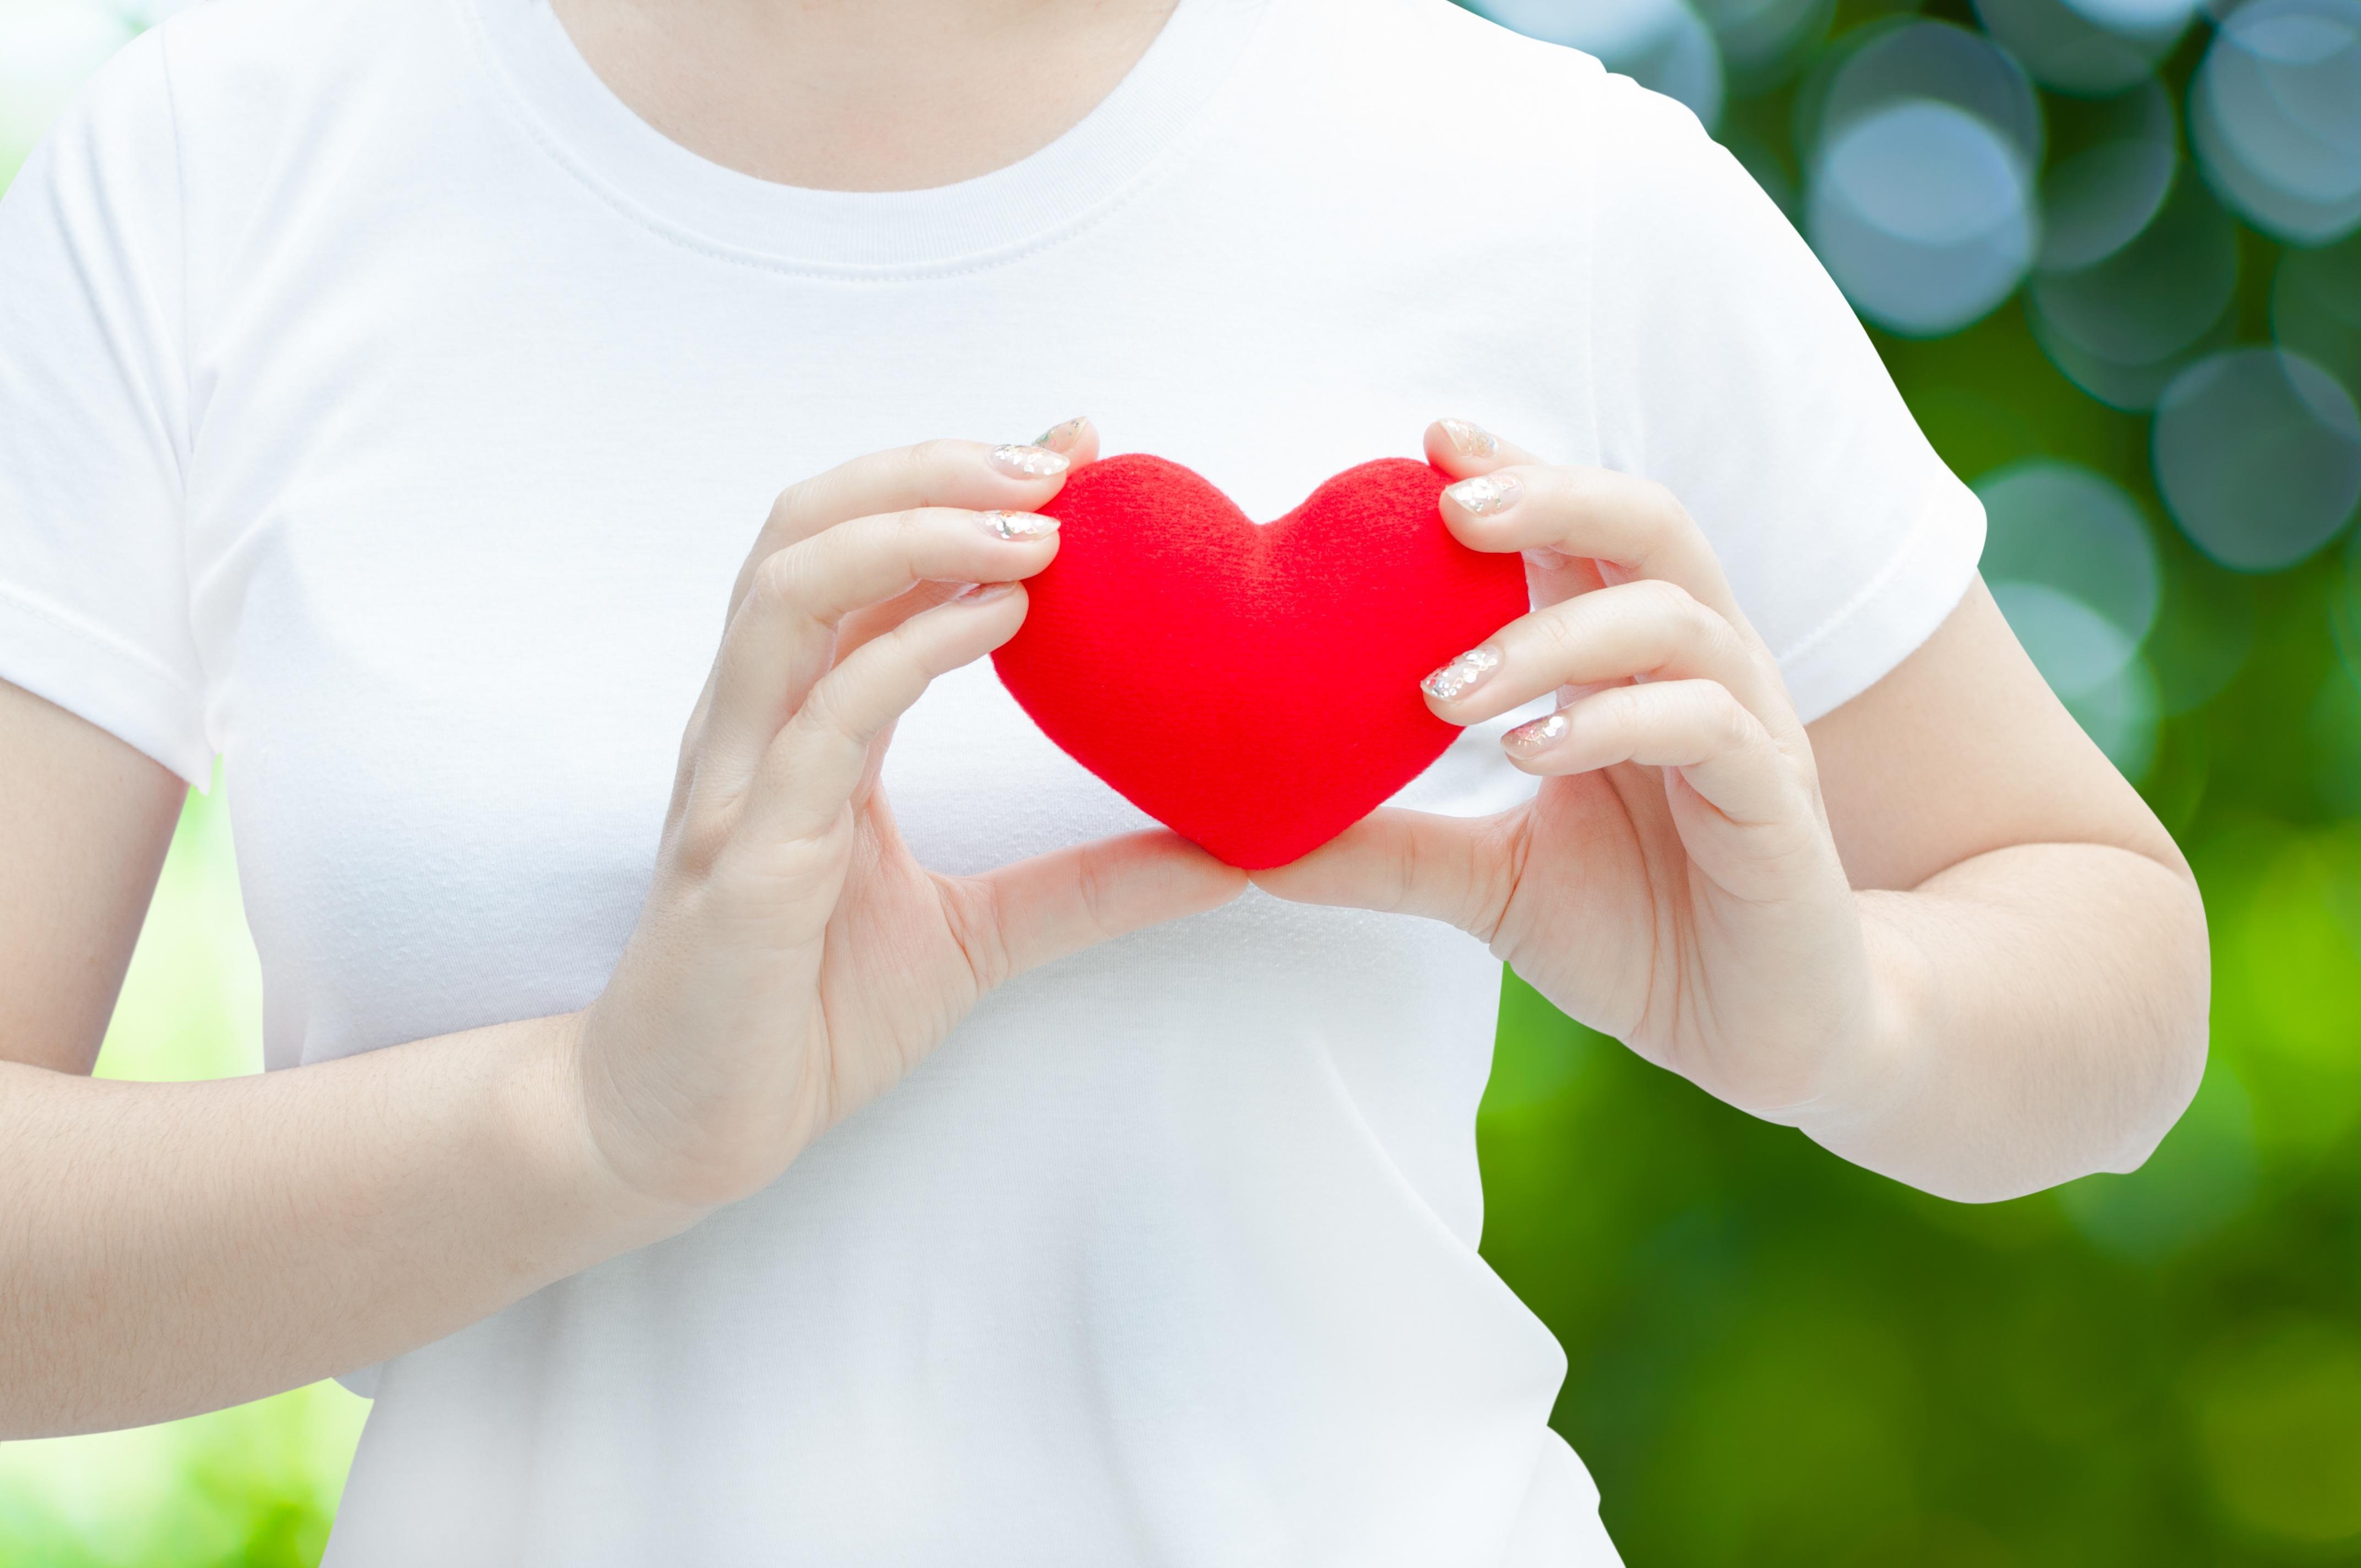 CIS women heart disease